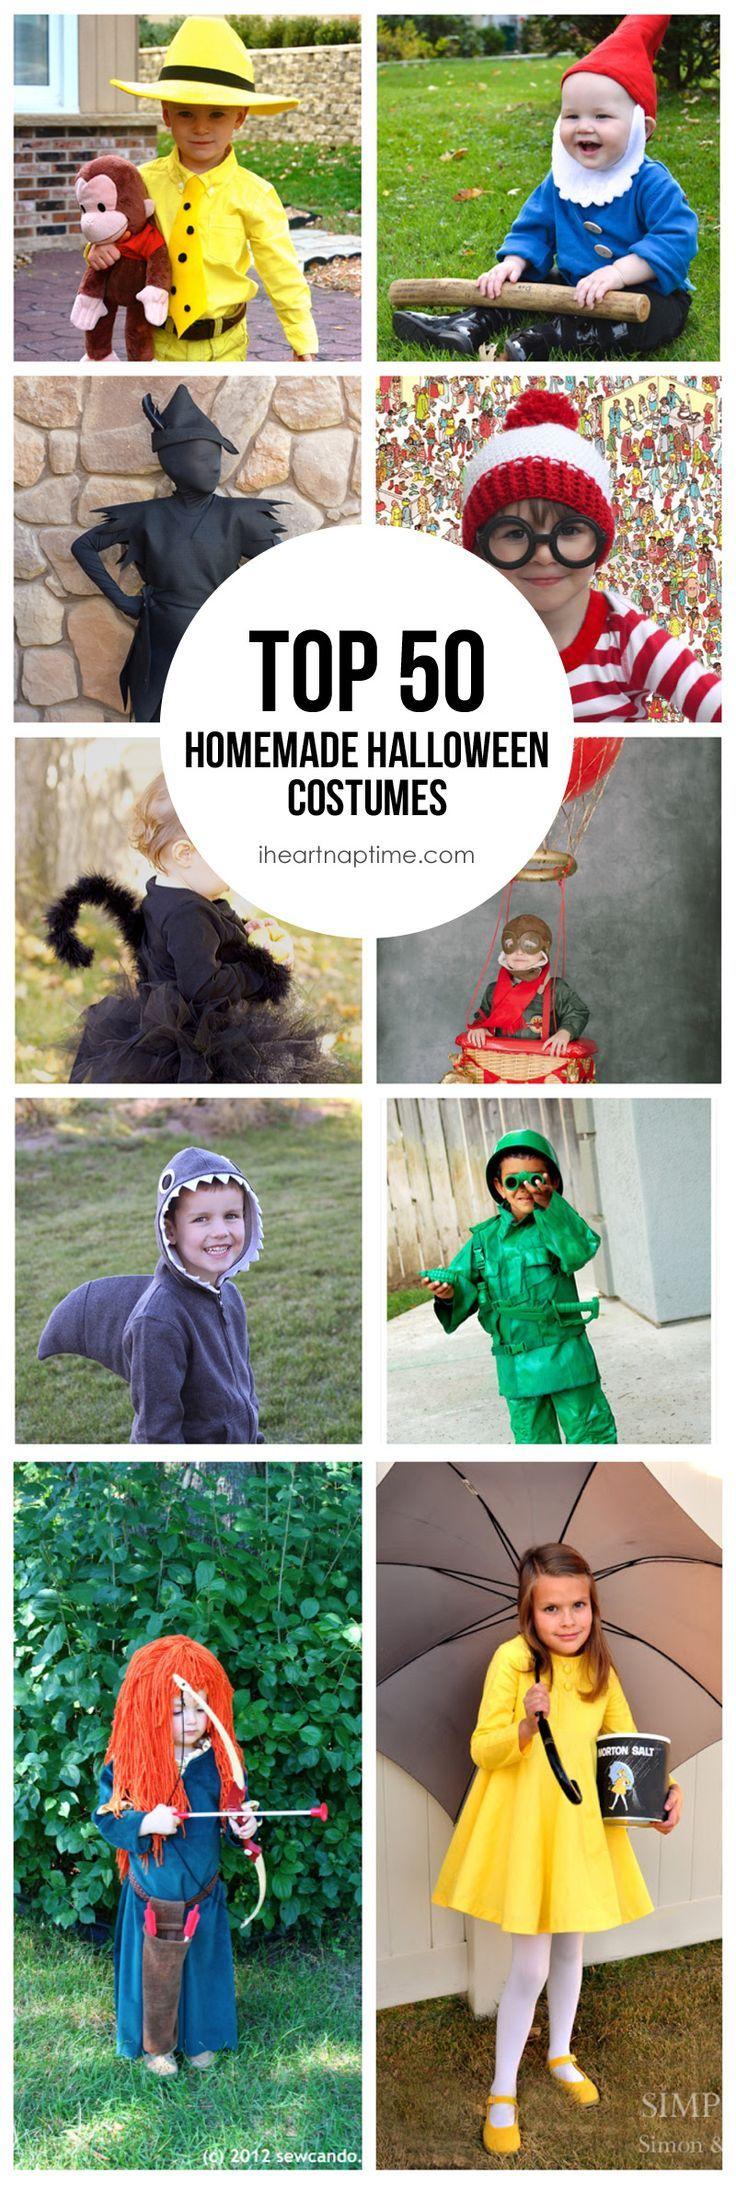 Top 50 Homemade Costumes on iheartnaptime.com